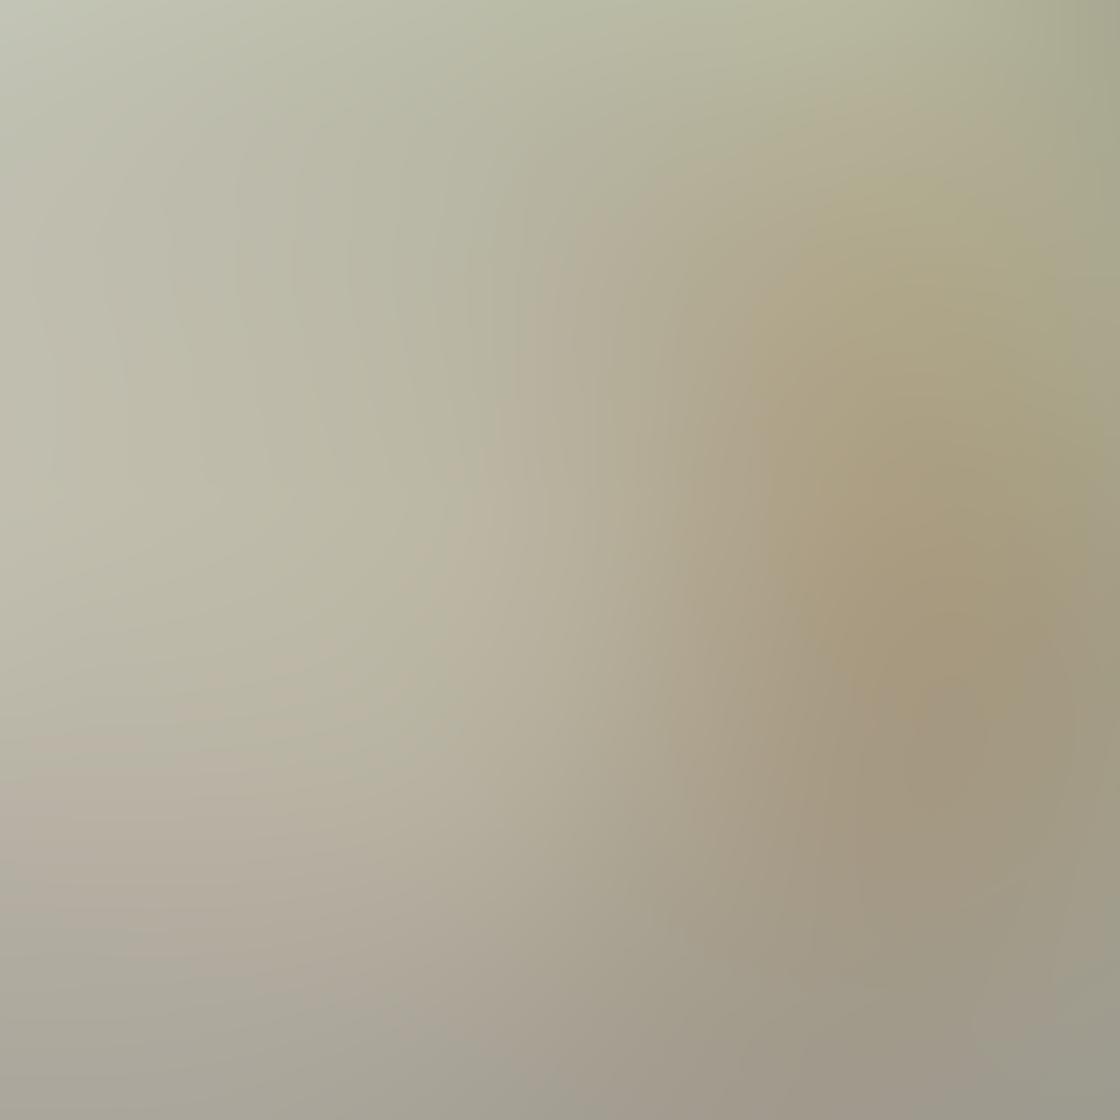 iPhone Photo of Seasons 12